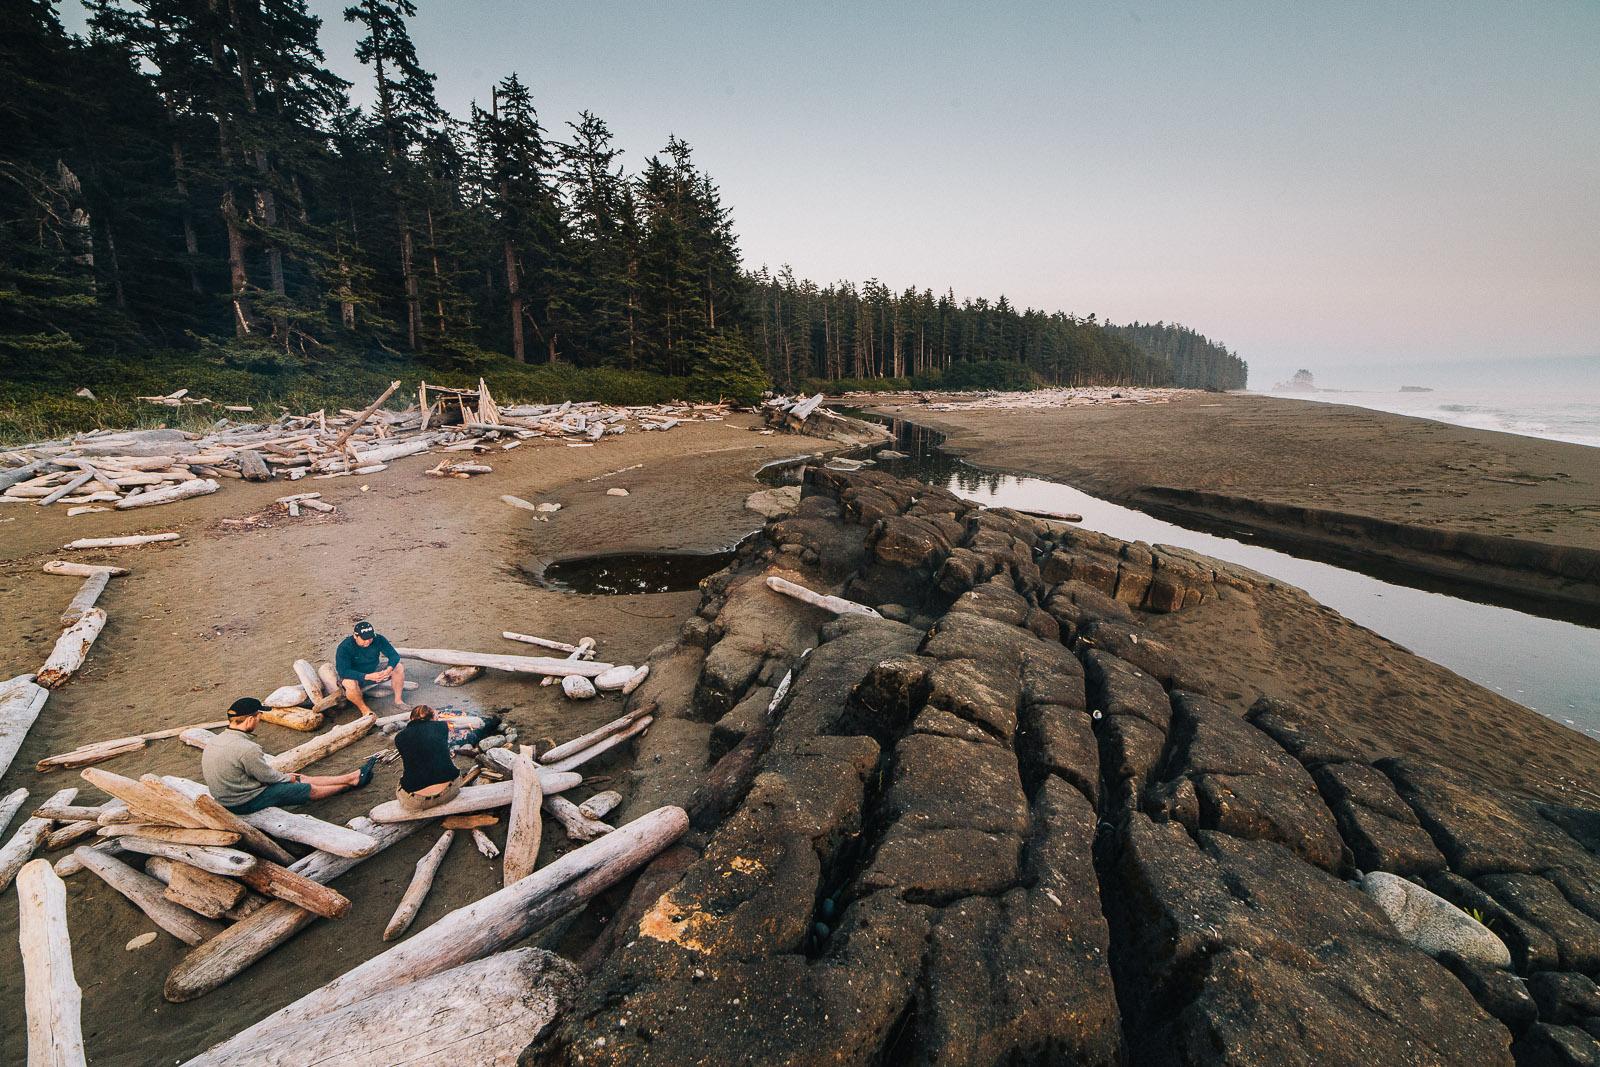 west coast trail campsite